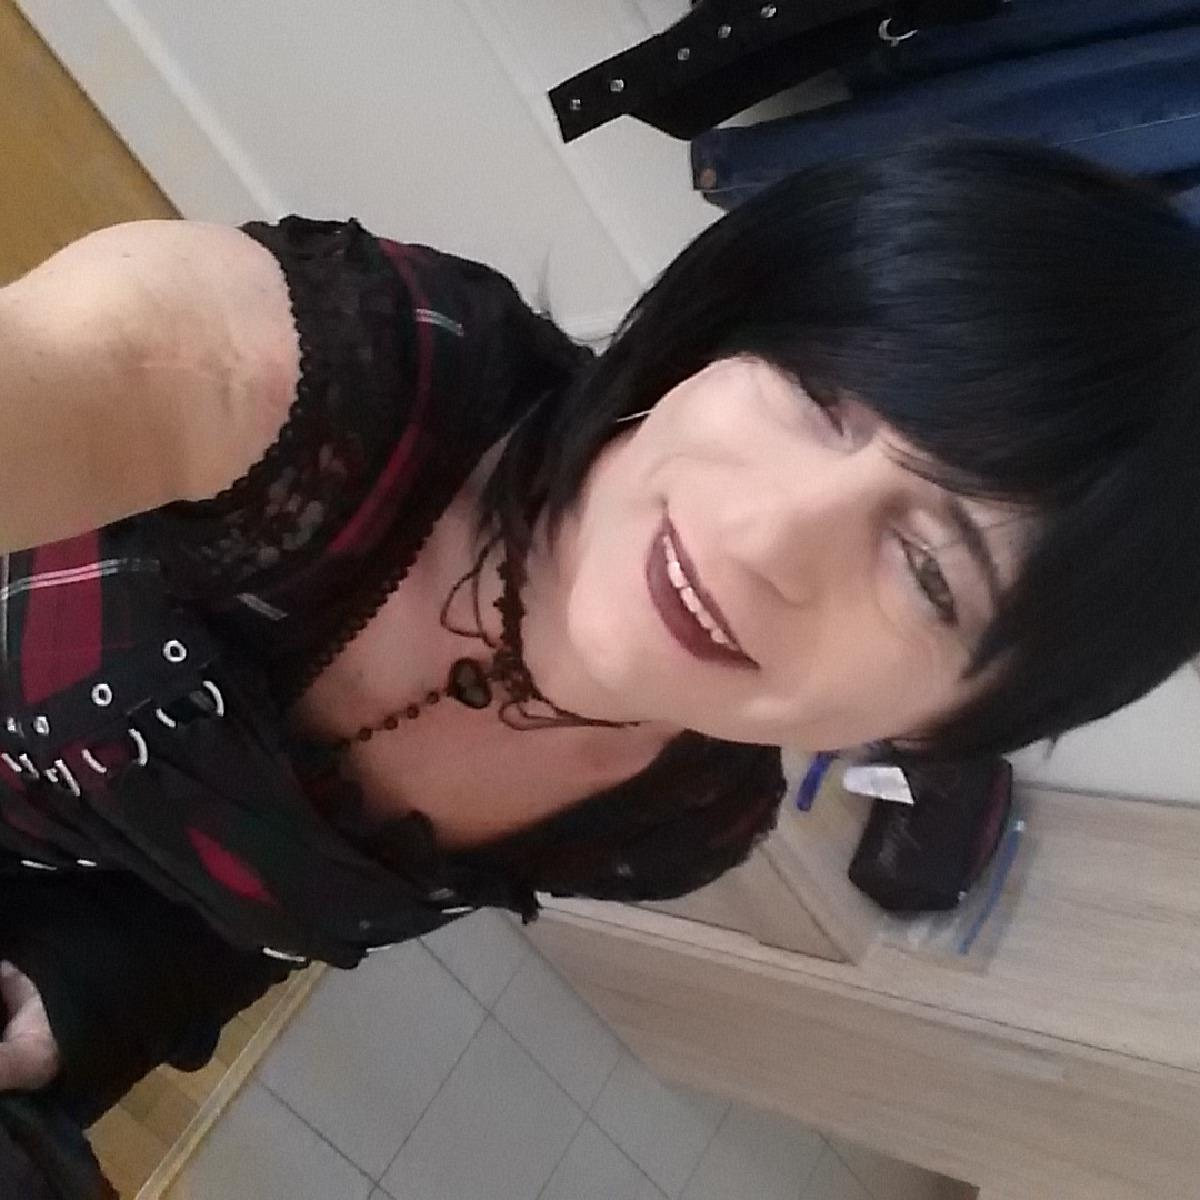 Yvonne_kss Avatar